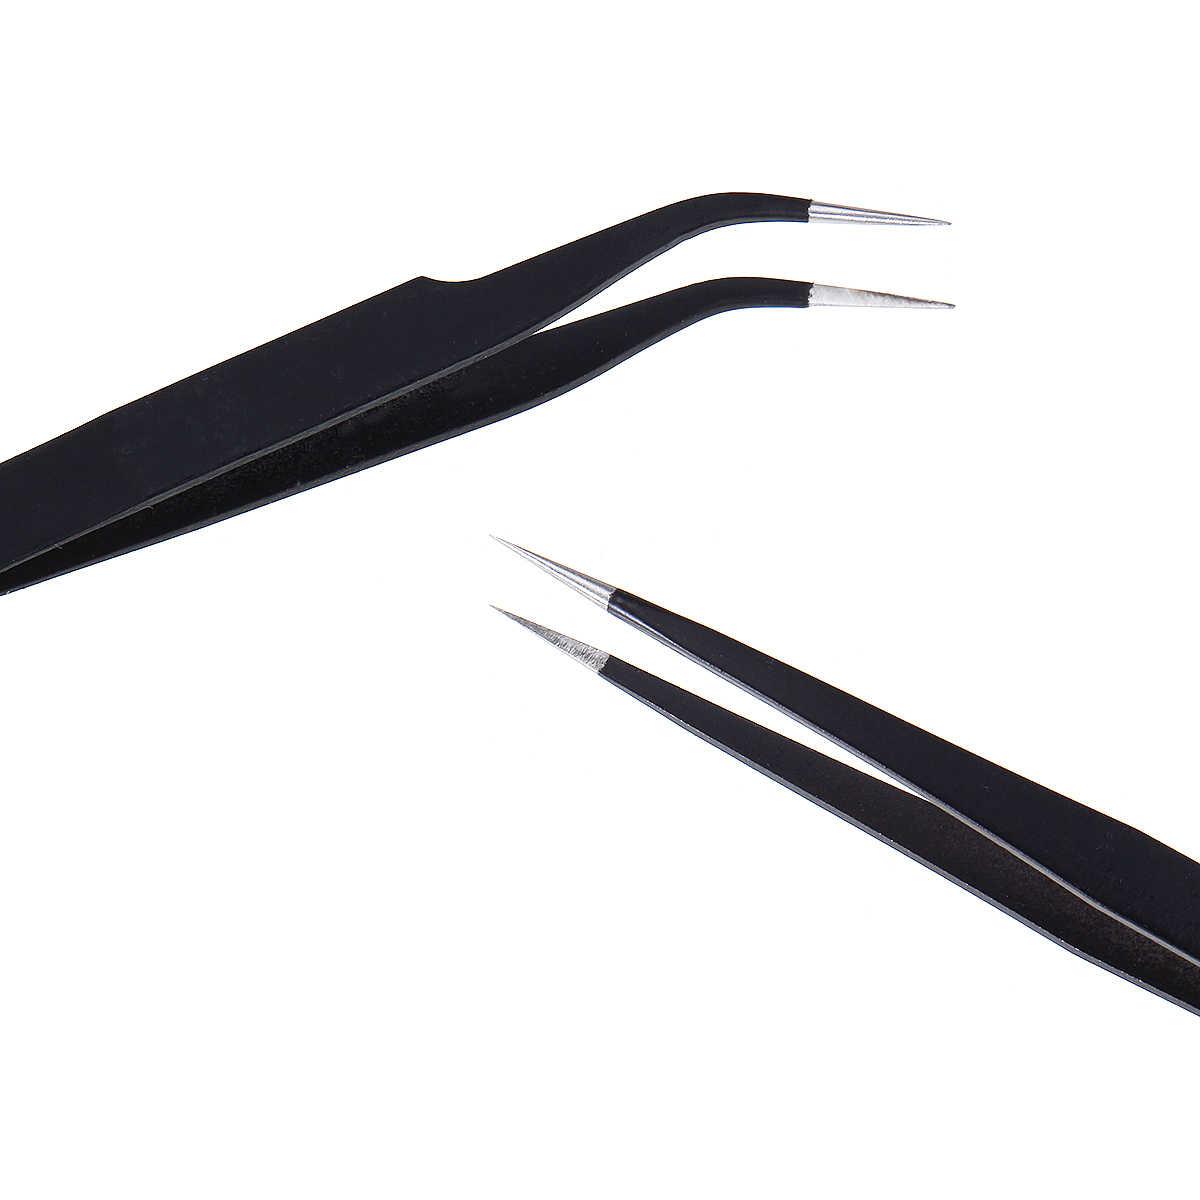 EU/US Plug 110V 220V 60W Thermoregulator Soldering Iron Kit Desoldering Pump Solder Wire 5pcs tips Portable Welding Repair Tool